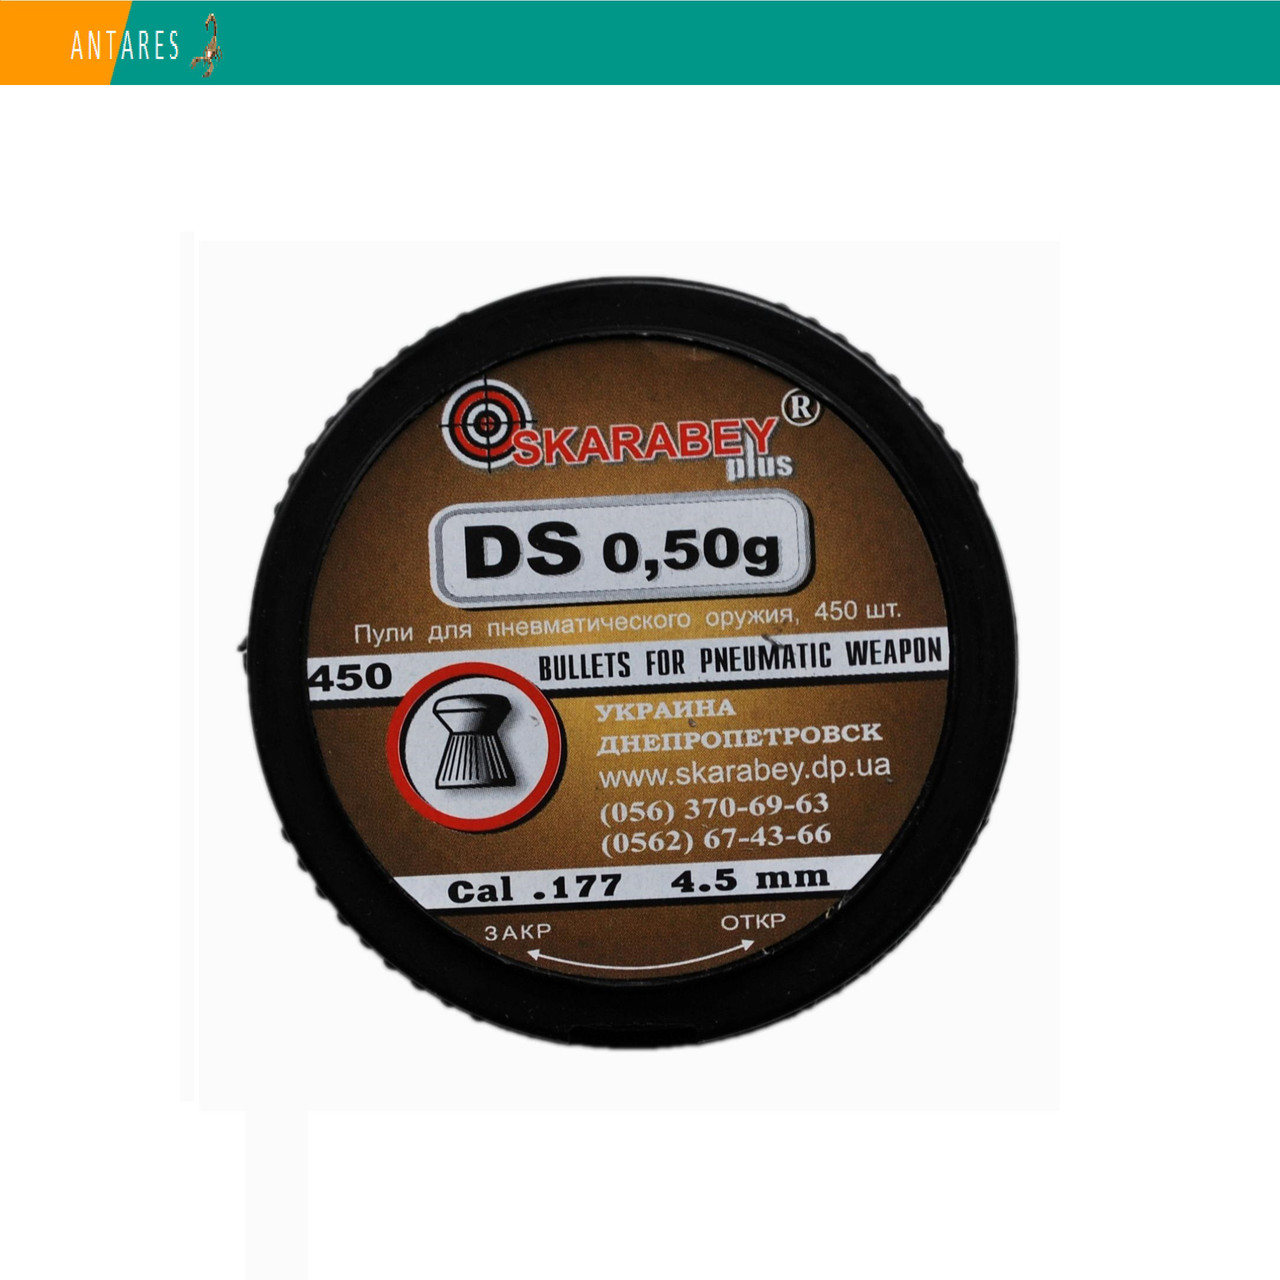 Пневматические пули Скарабей 4.5 мм, 0,50 г, 450 штук DS-0,50